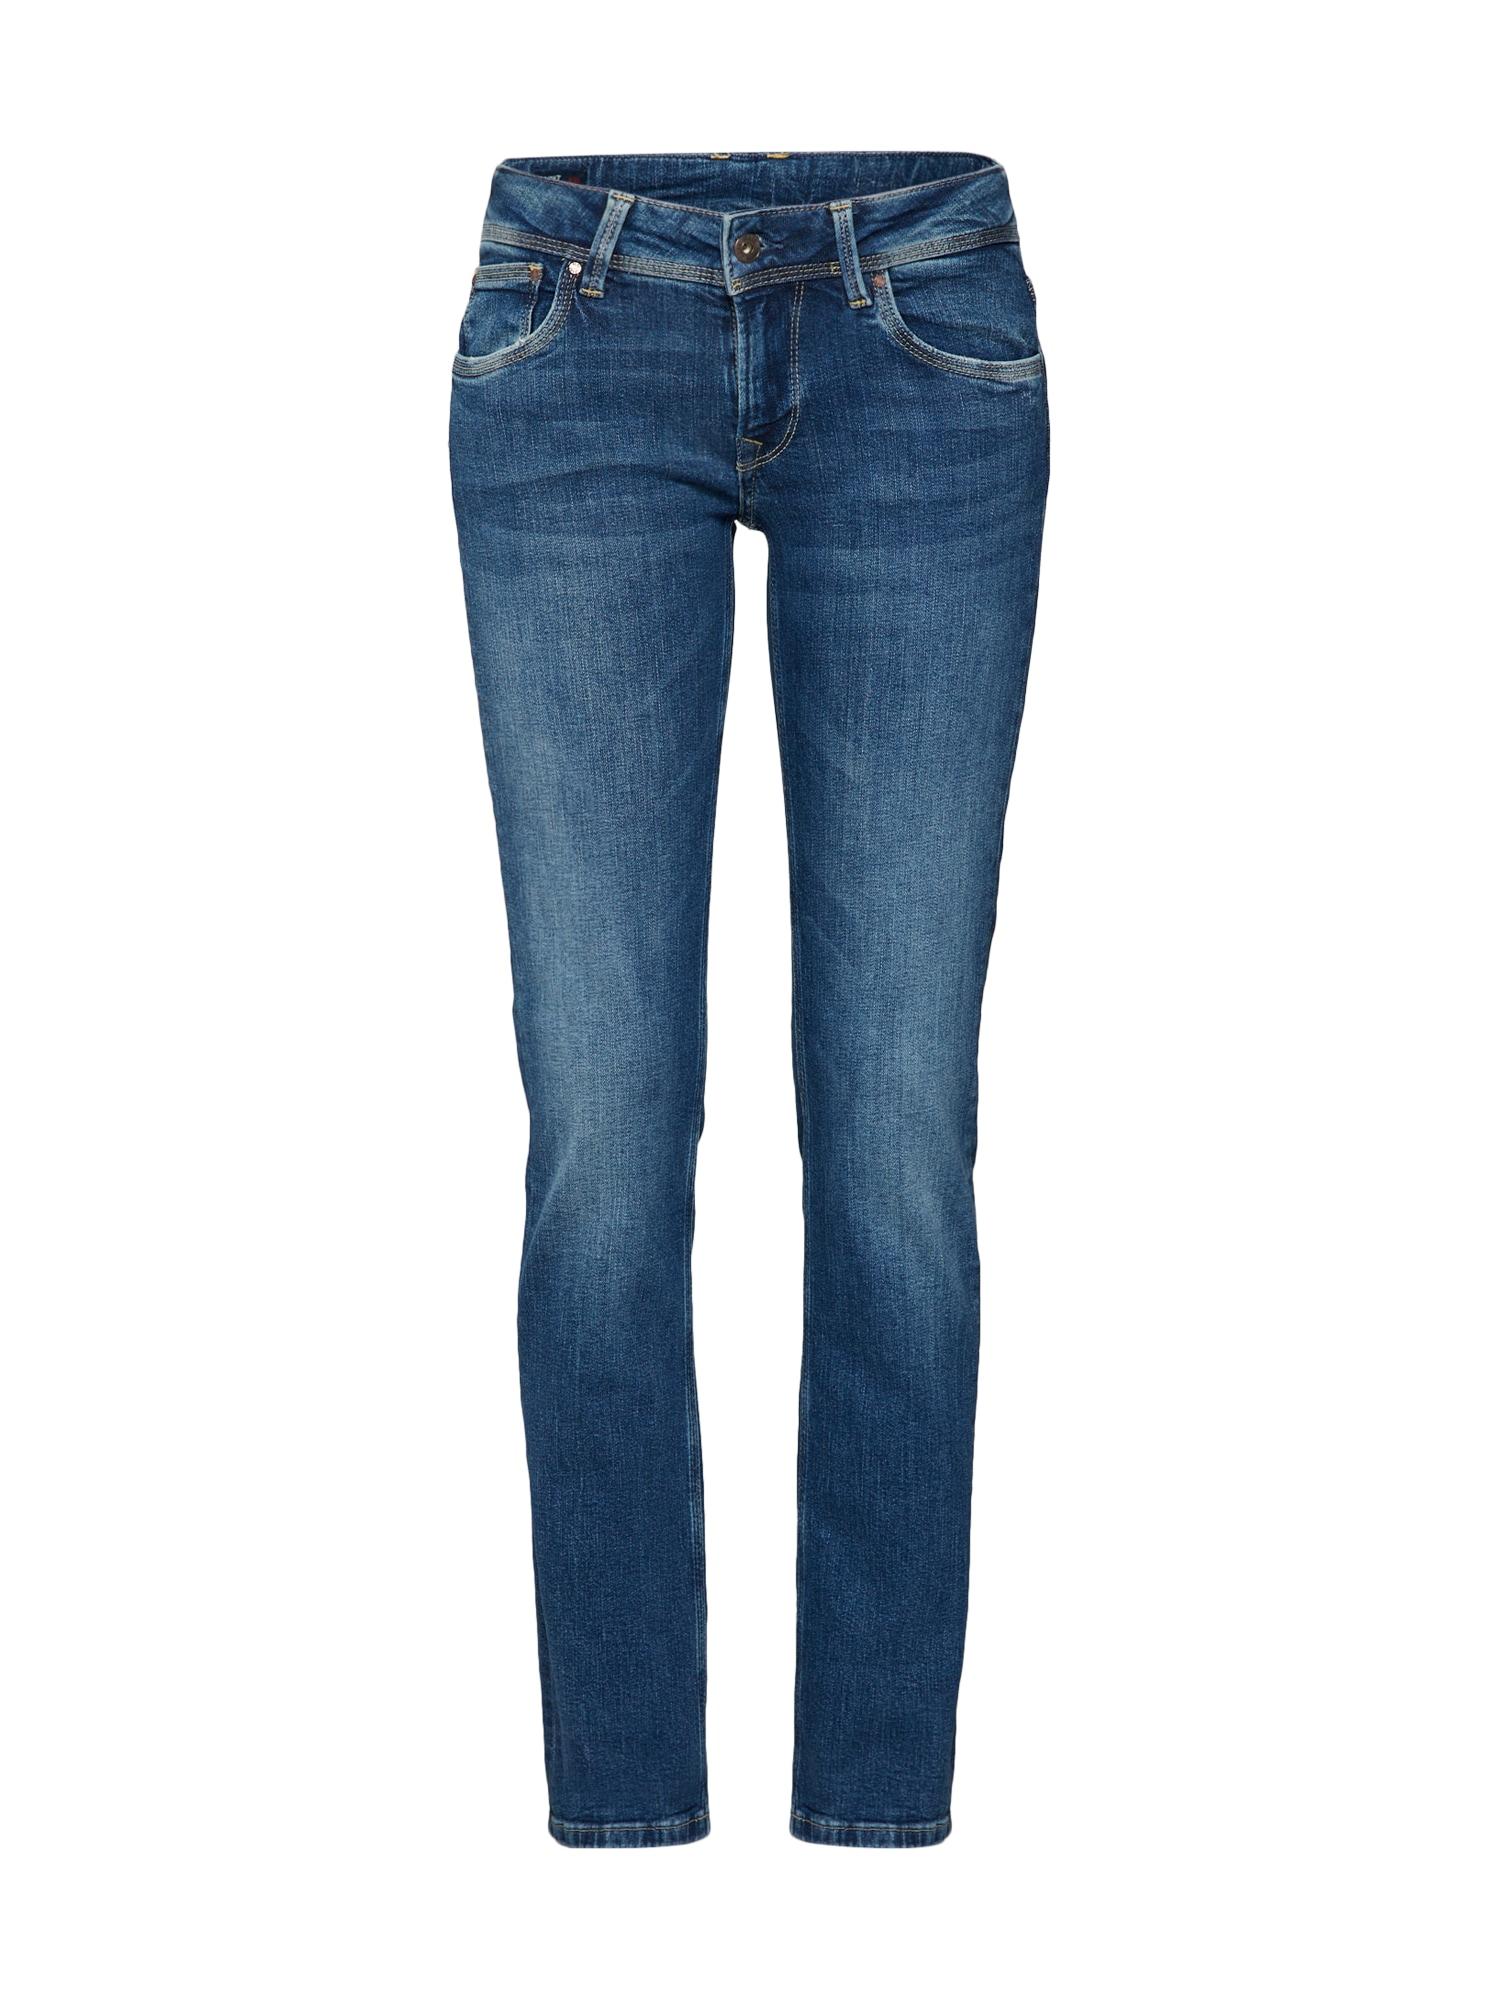 Pepe Jeans Dames Jeans Saturn blauw denim